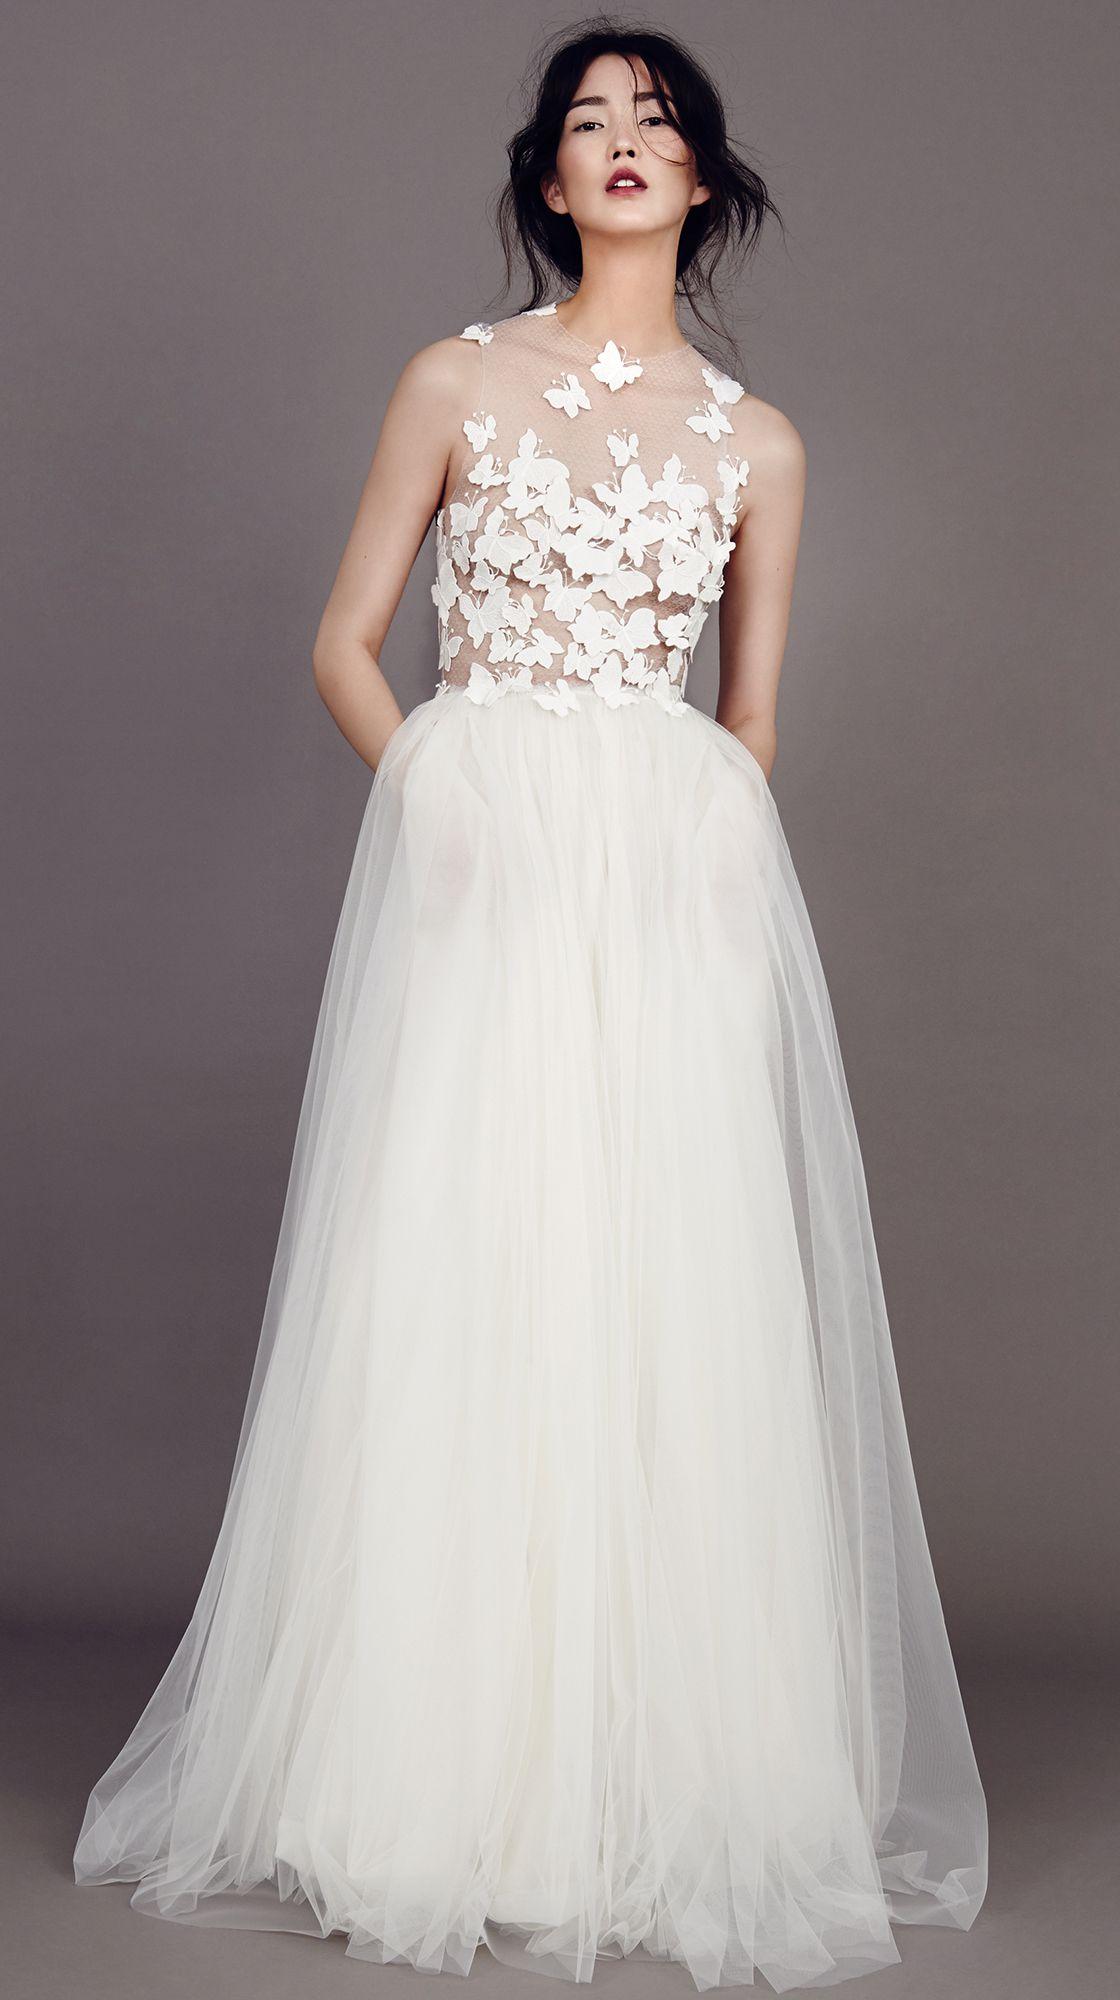 Papillon D`Amour Dress | Brautkleid . wedding dress | Rheinland ...